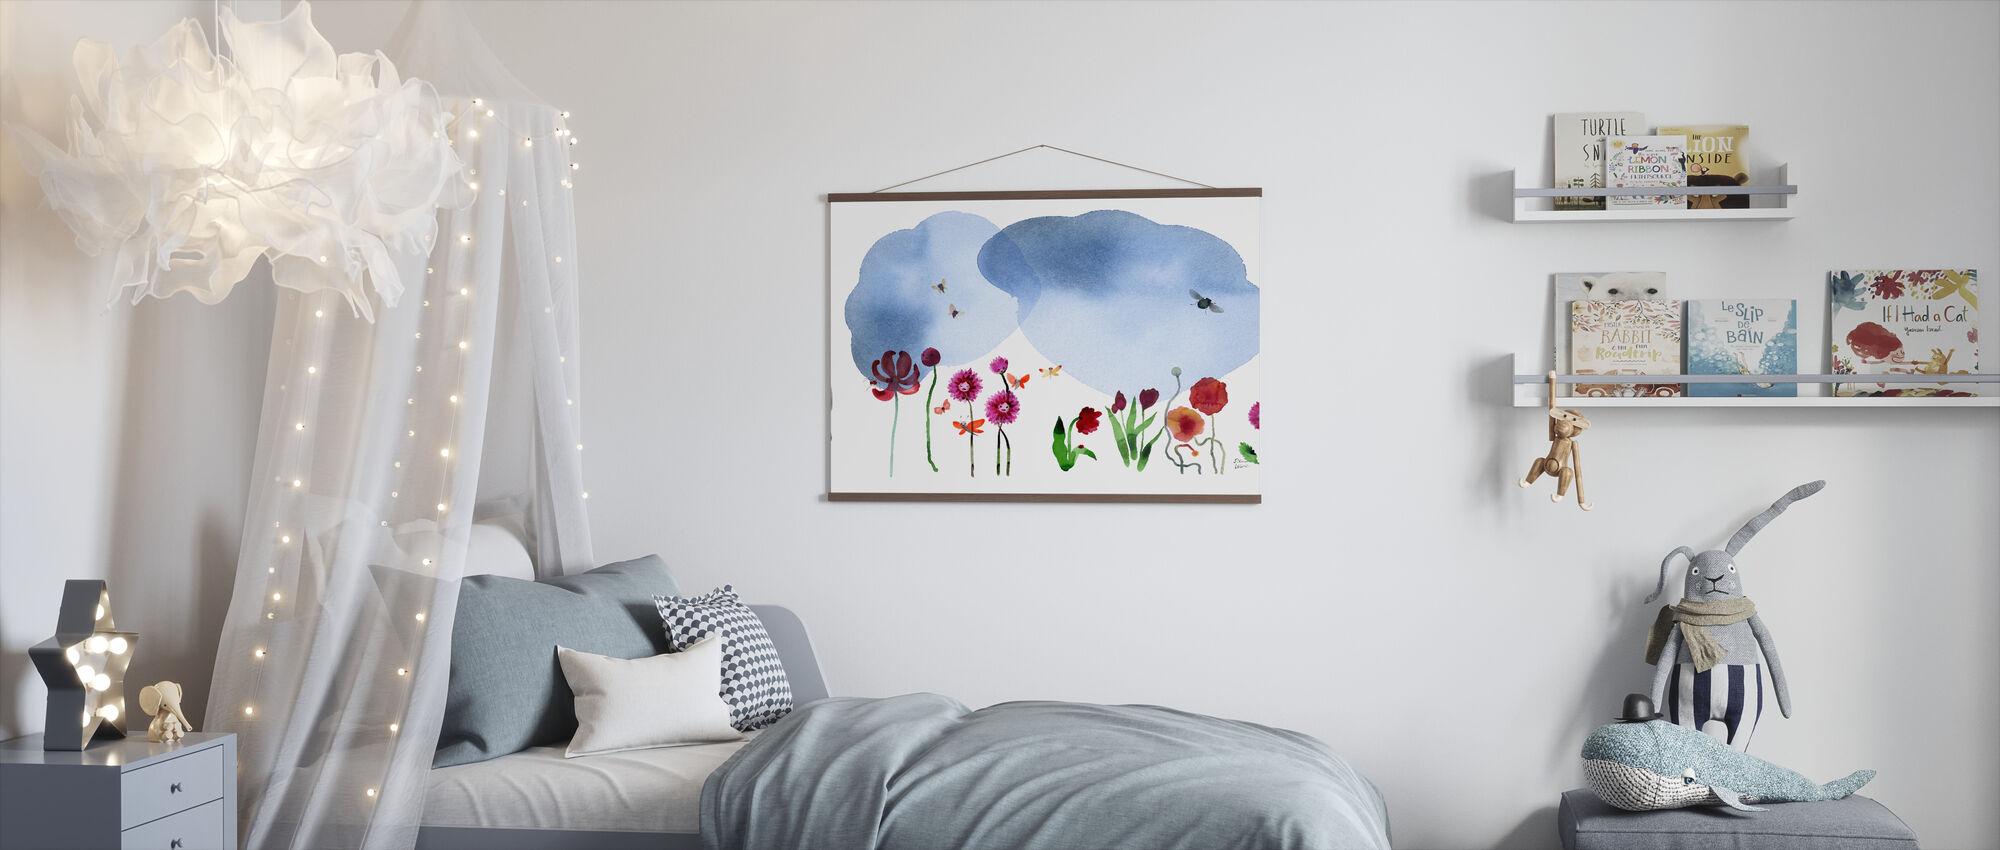 Water Color Flowers II - Poster - Kids Room